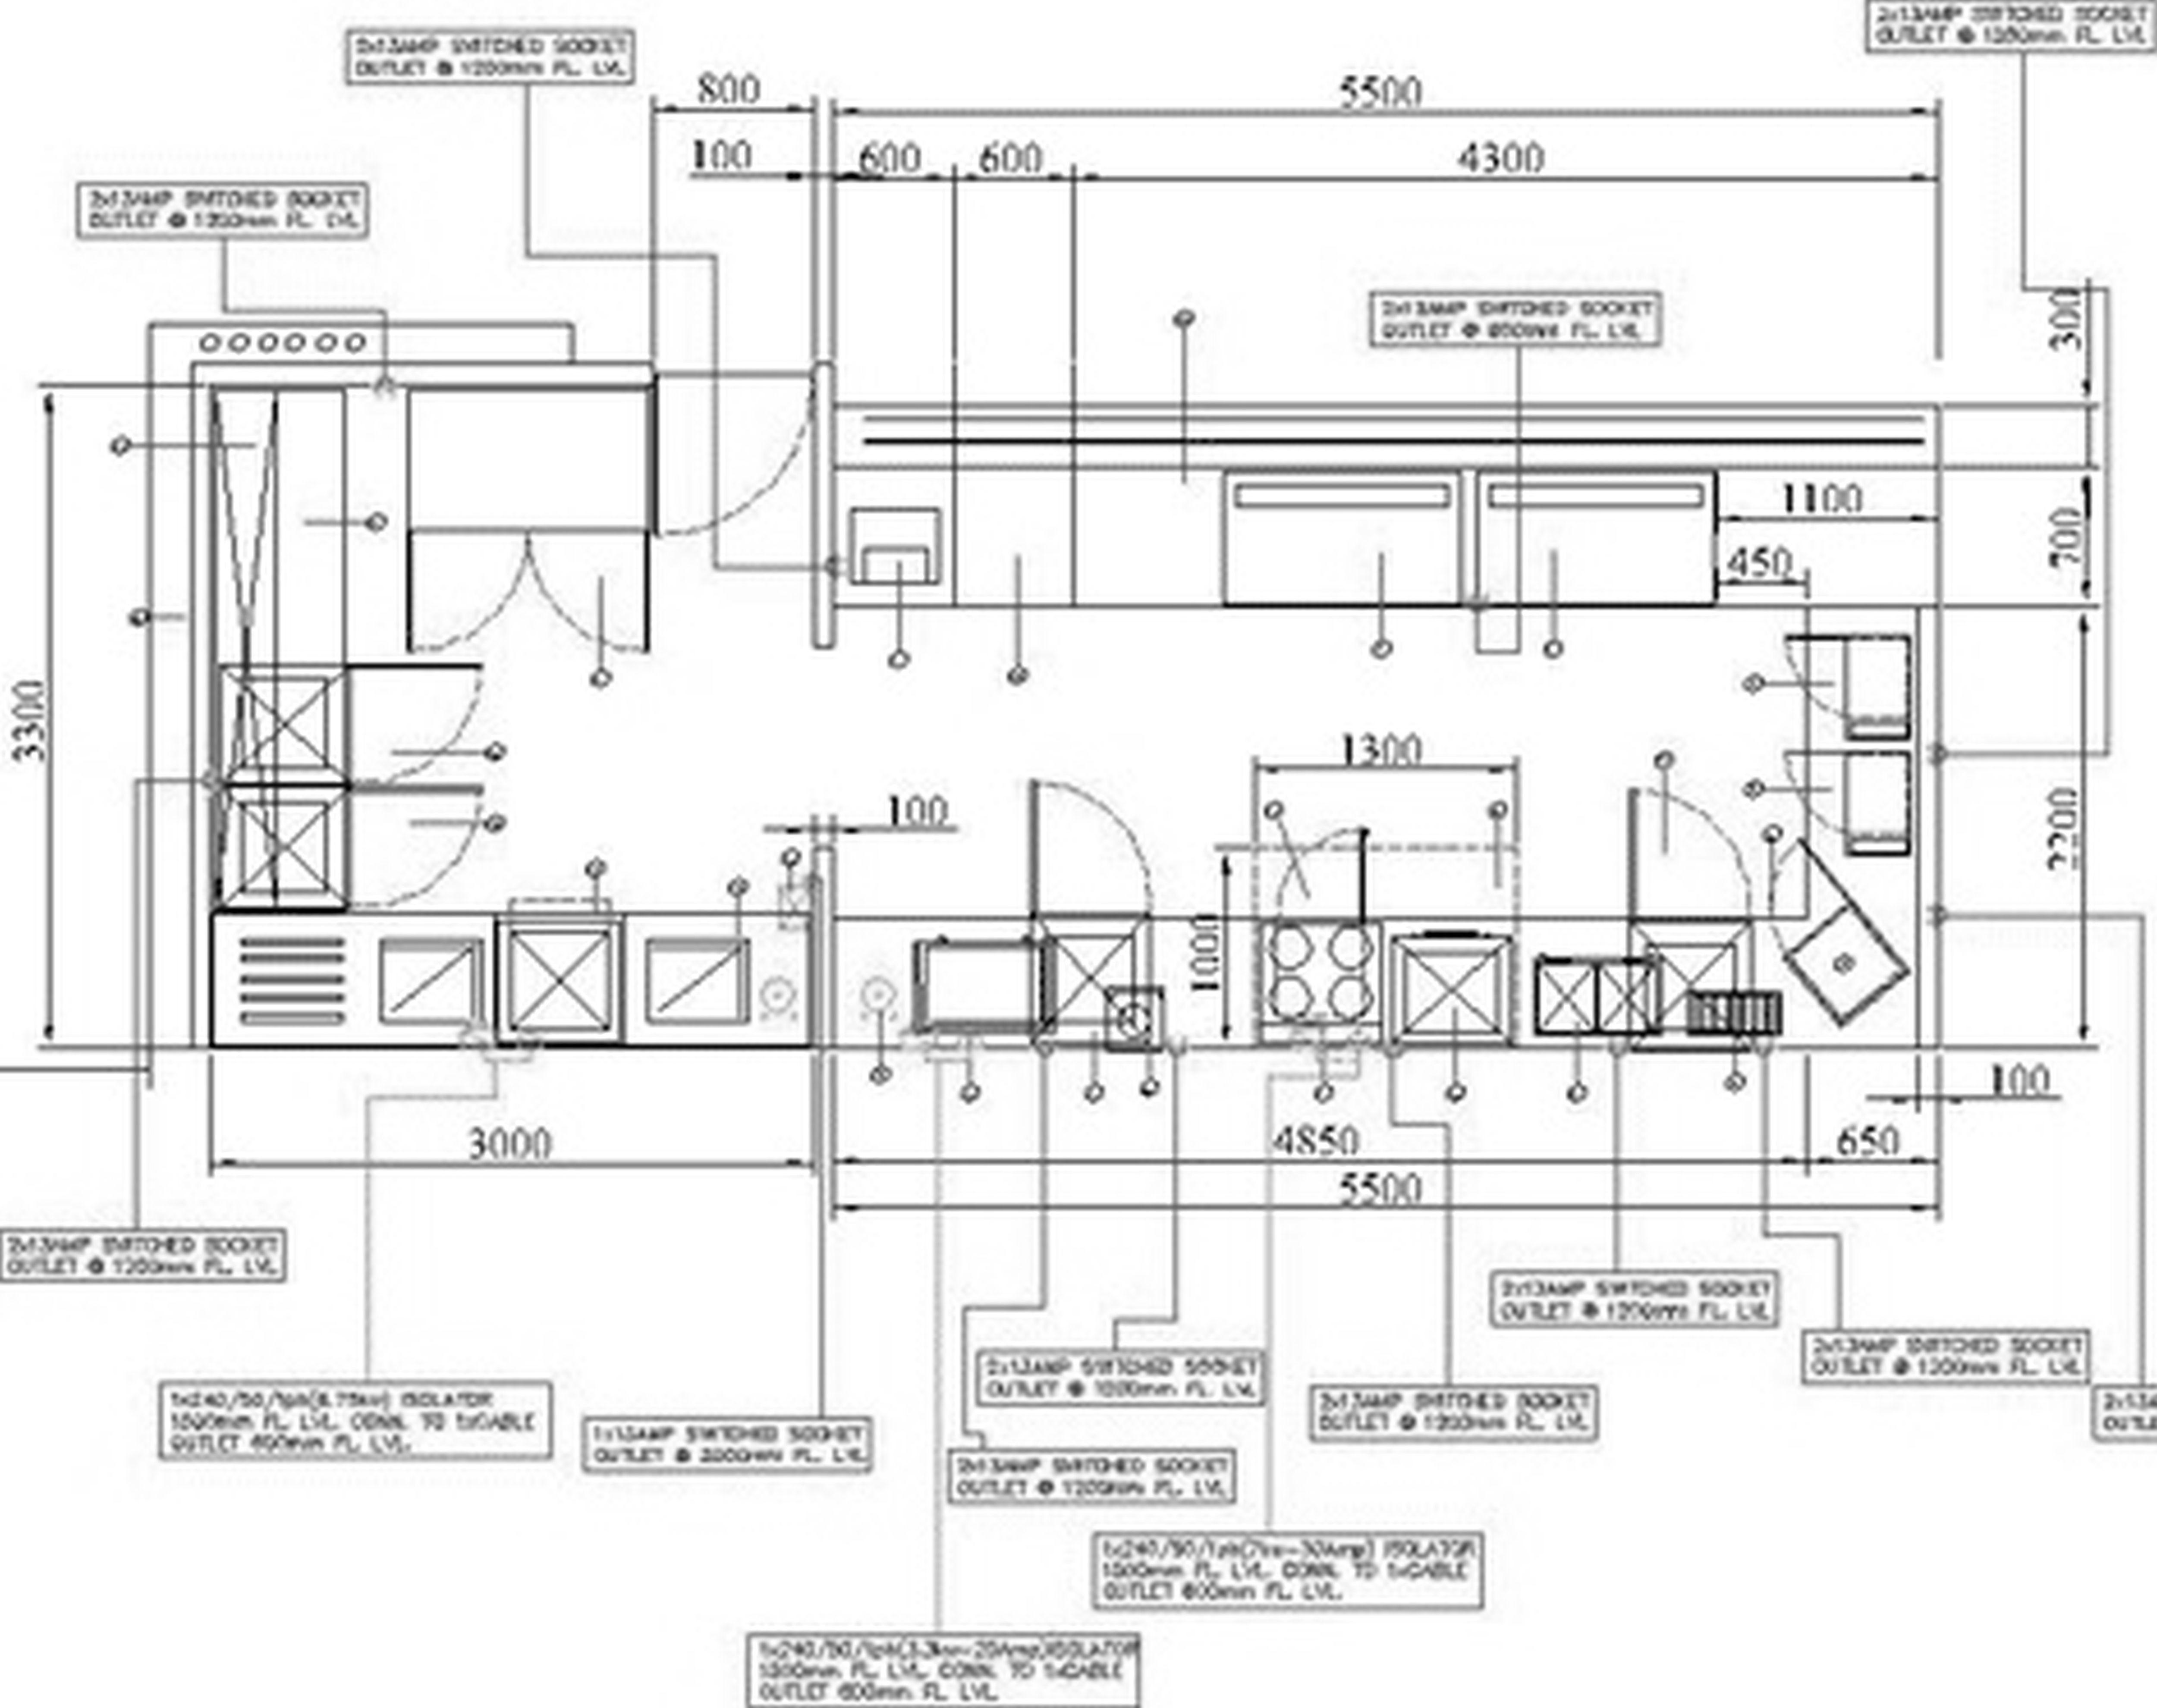 equipment sheds diagrams